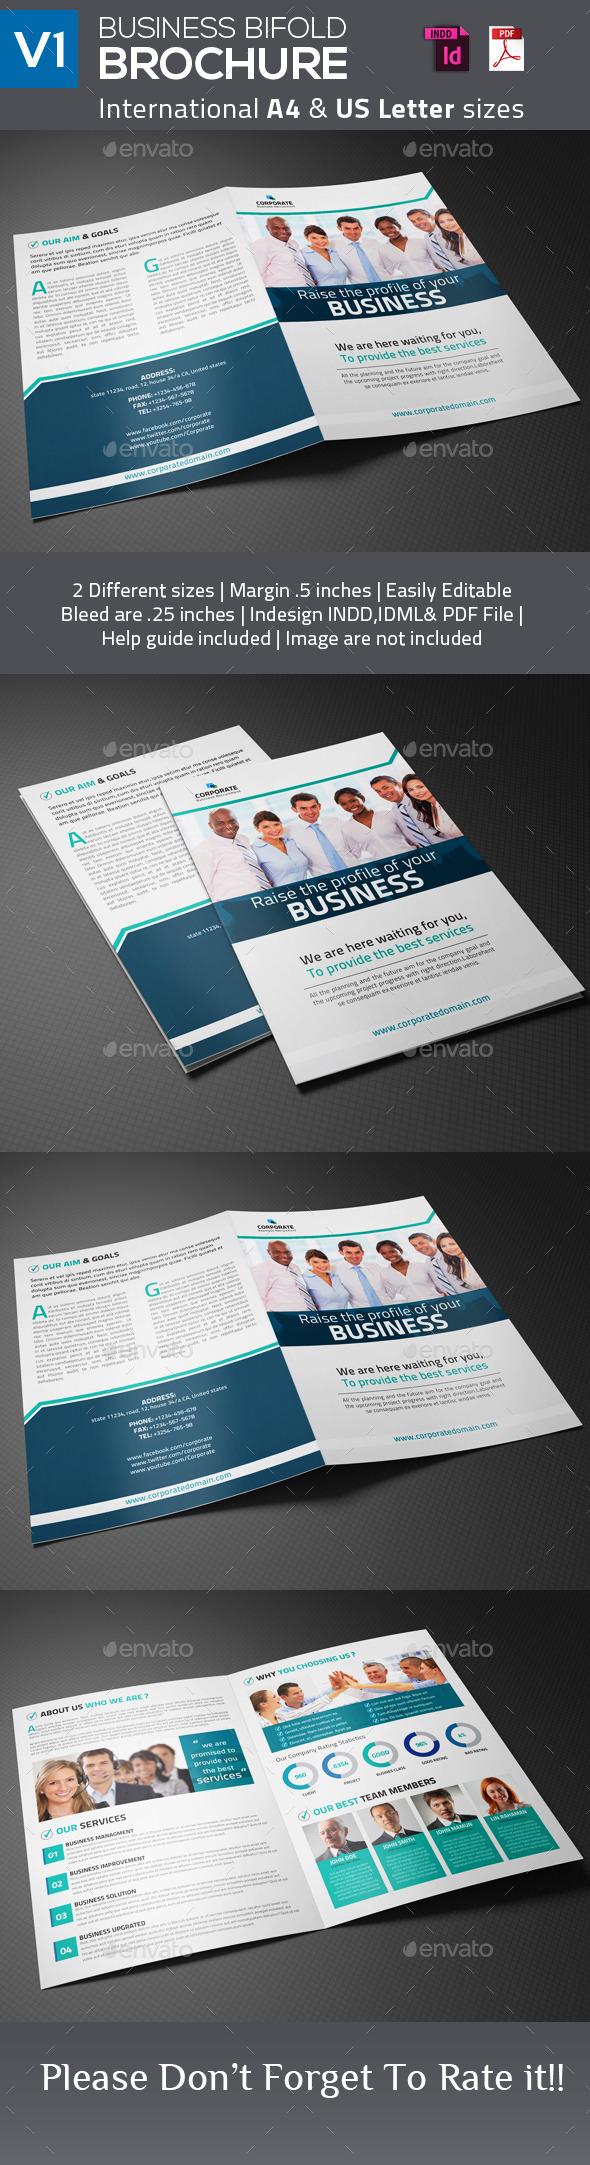 Business Bifold Brochure V1 - Corporate Brochures